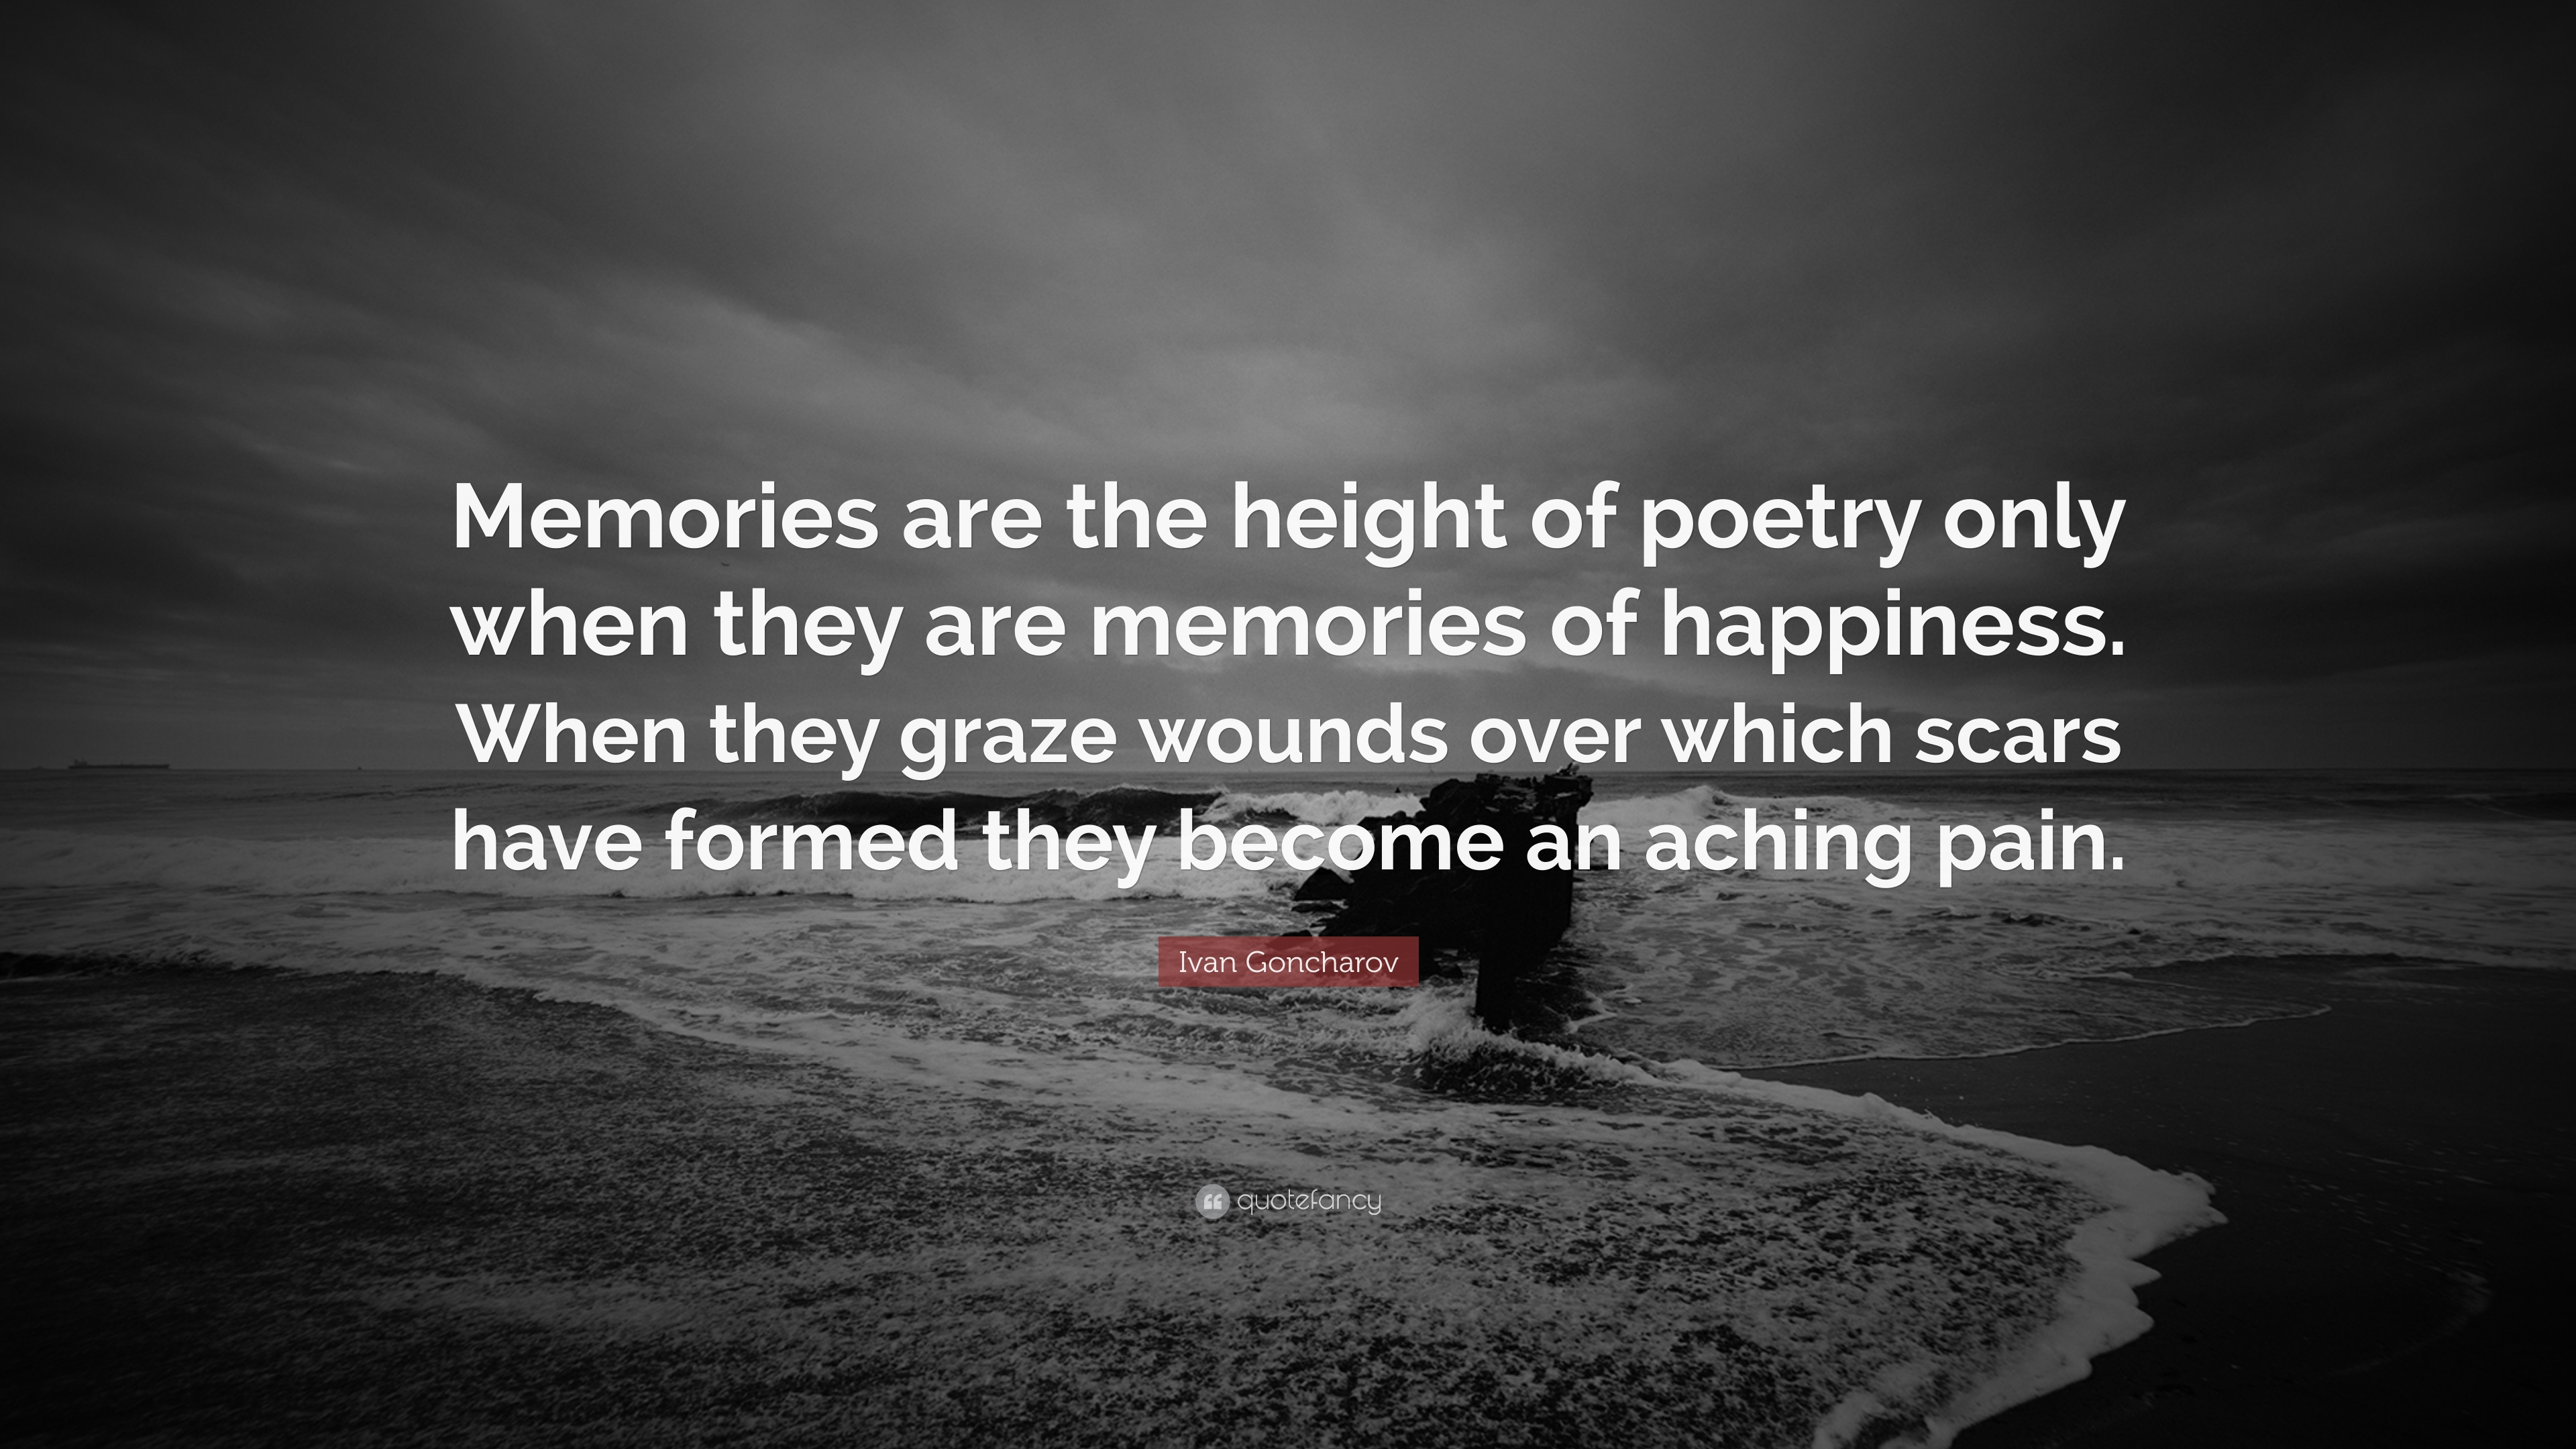 ivan goncharov quotes quotefancy